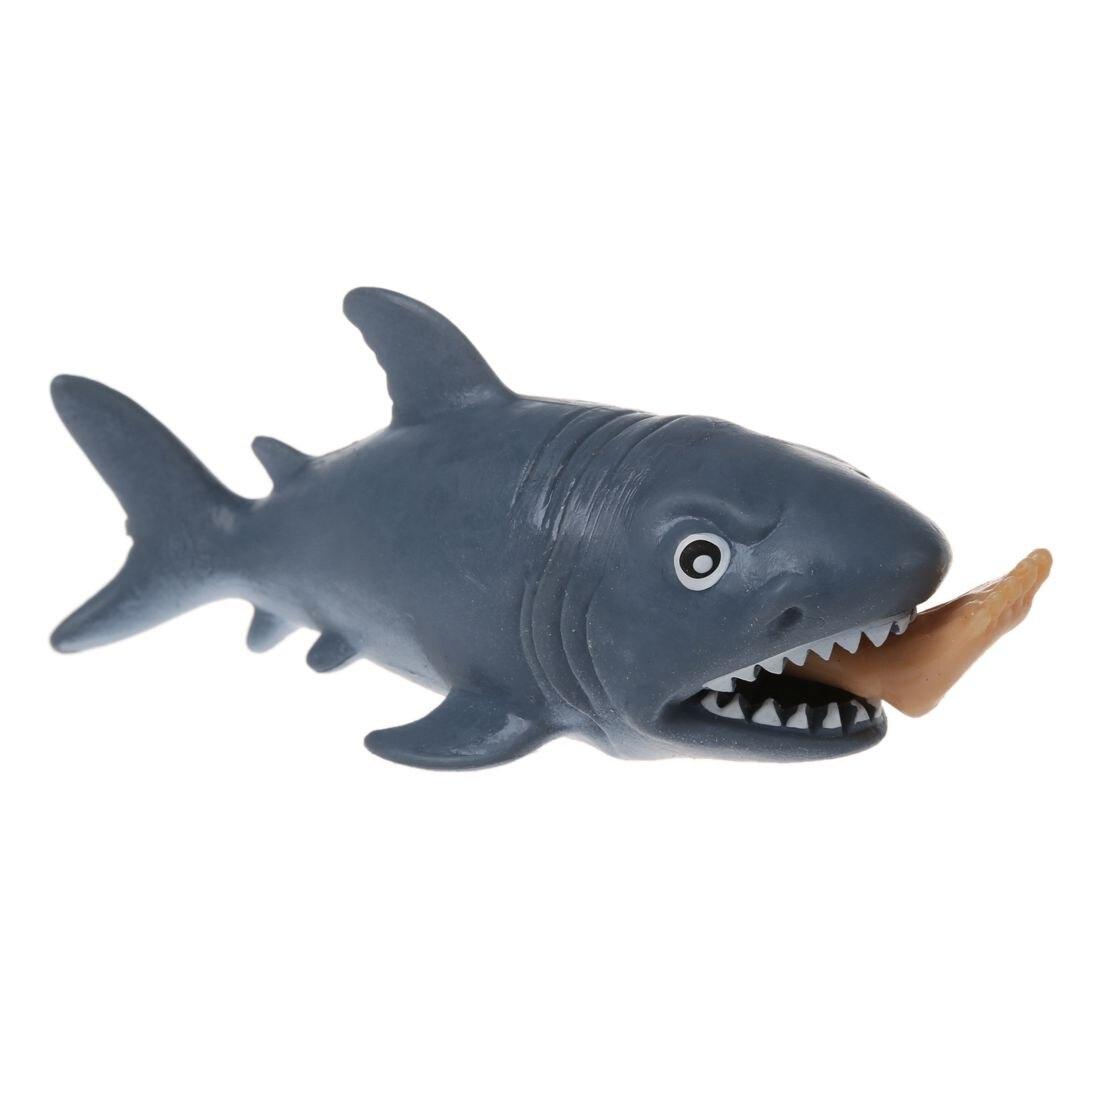 FBIL-Funny Man-eating Shark/Scary/Prank/Wacky/Squeezing/Stress/April Fools Toys